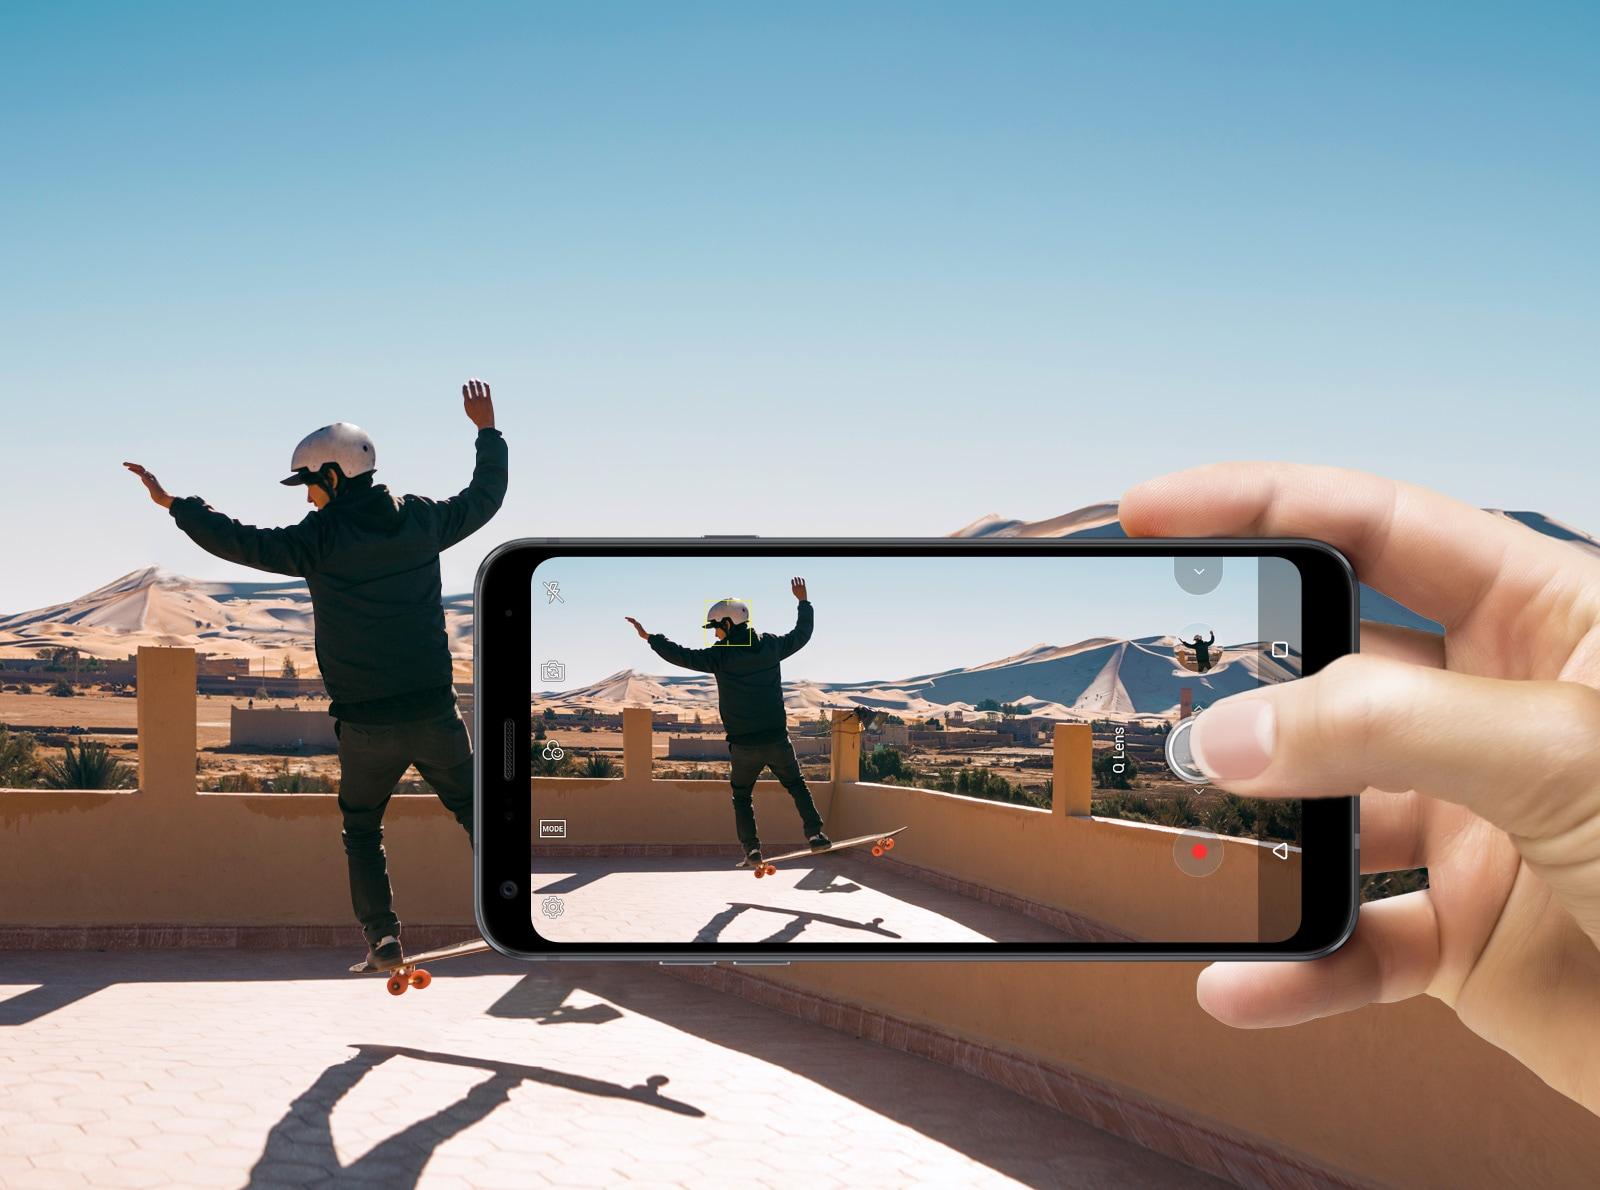 LG Q7+™ Smartphone With FullVision™ Display | LG India